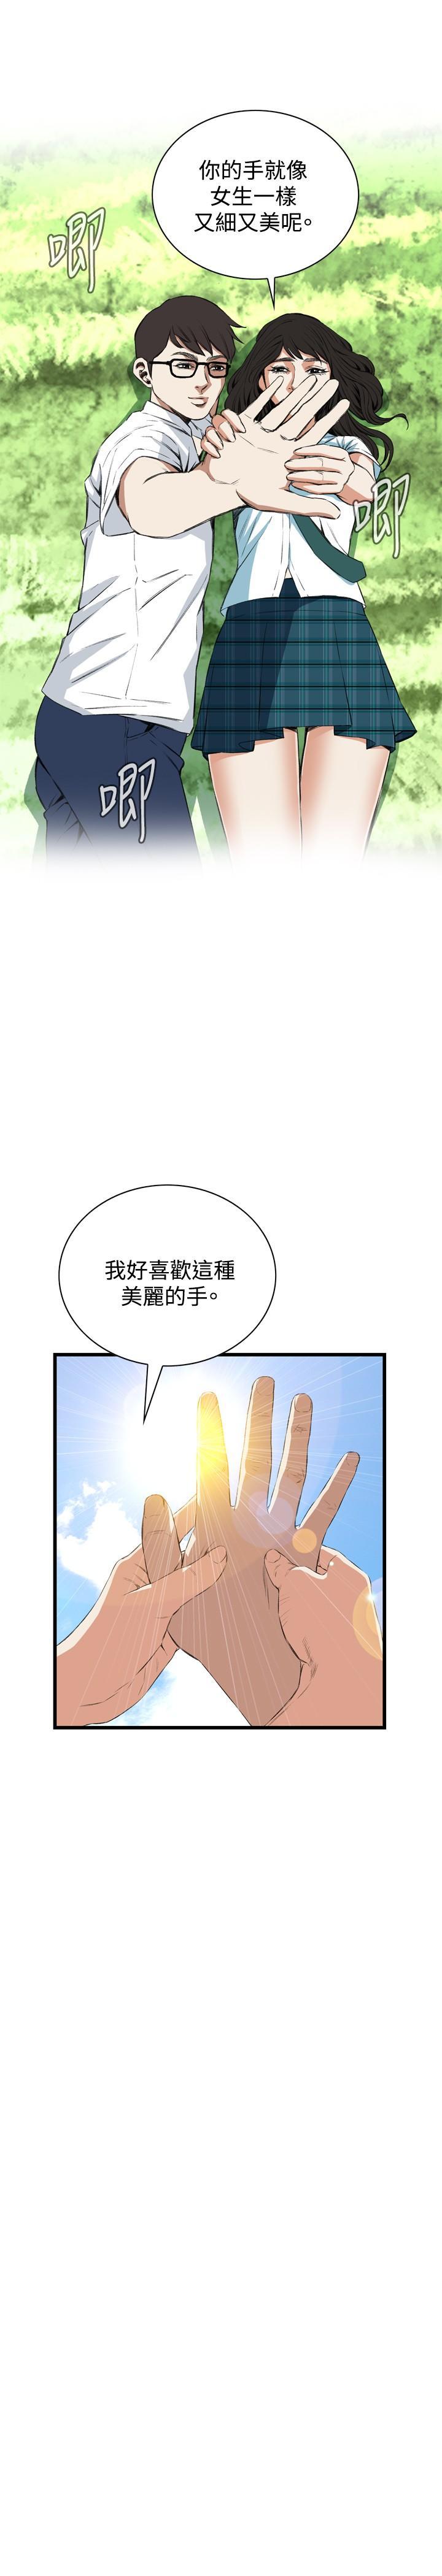 Take a Peek 偷窥 Ch.39~60 [Chinese]中文 443